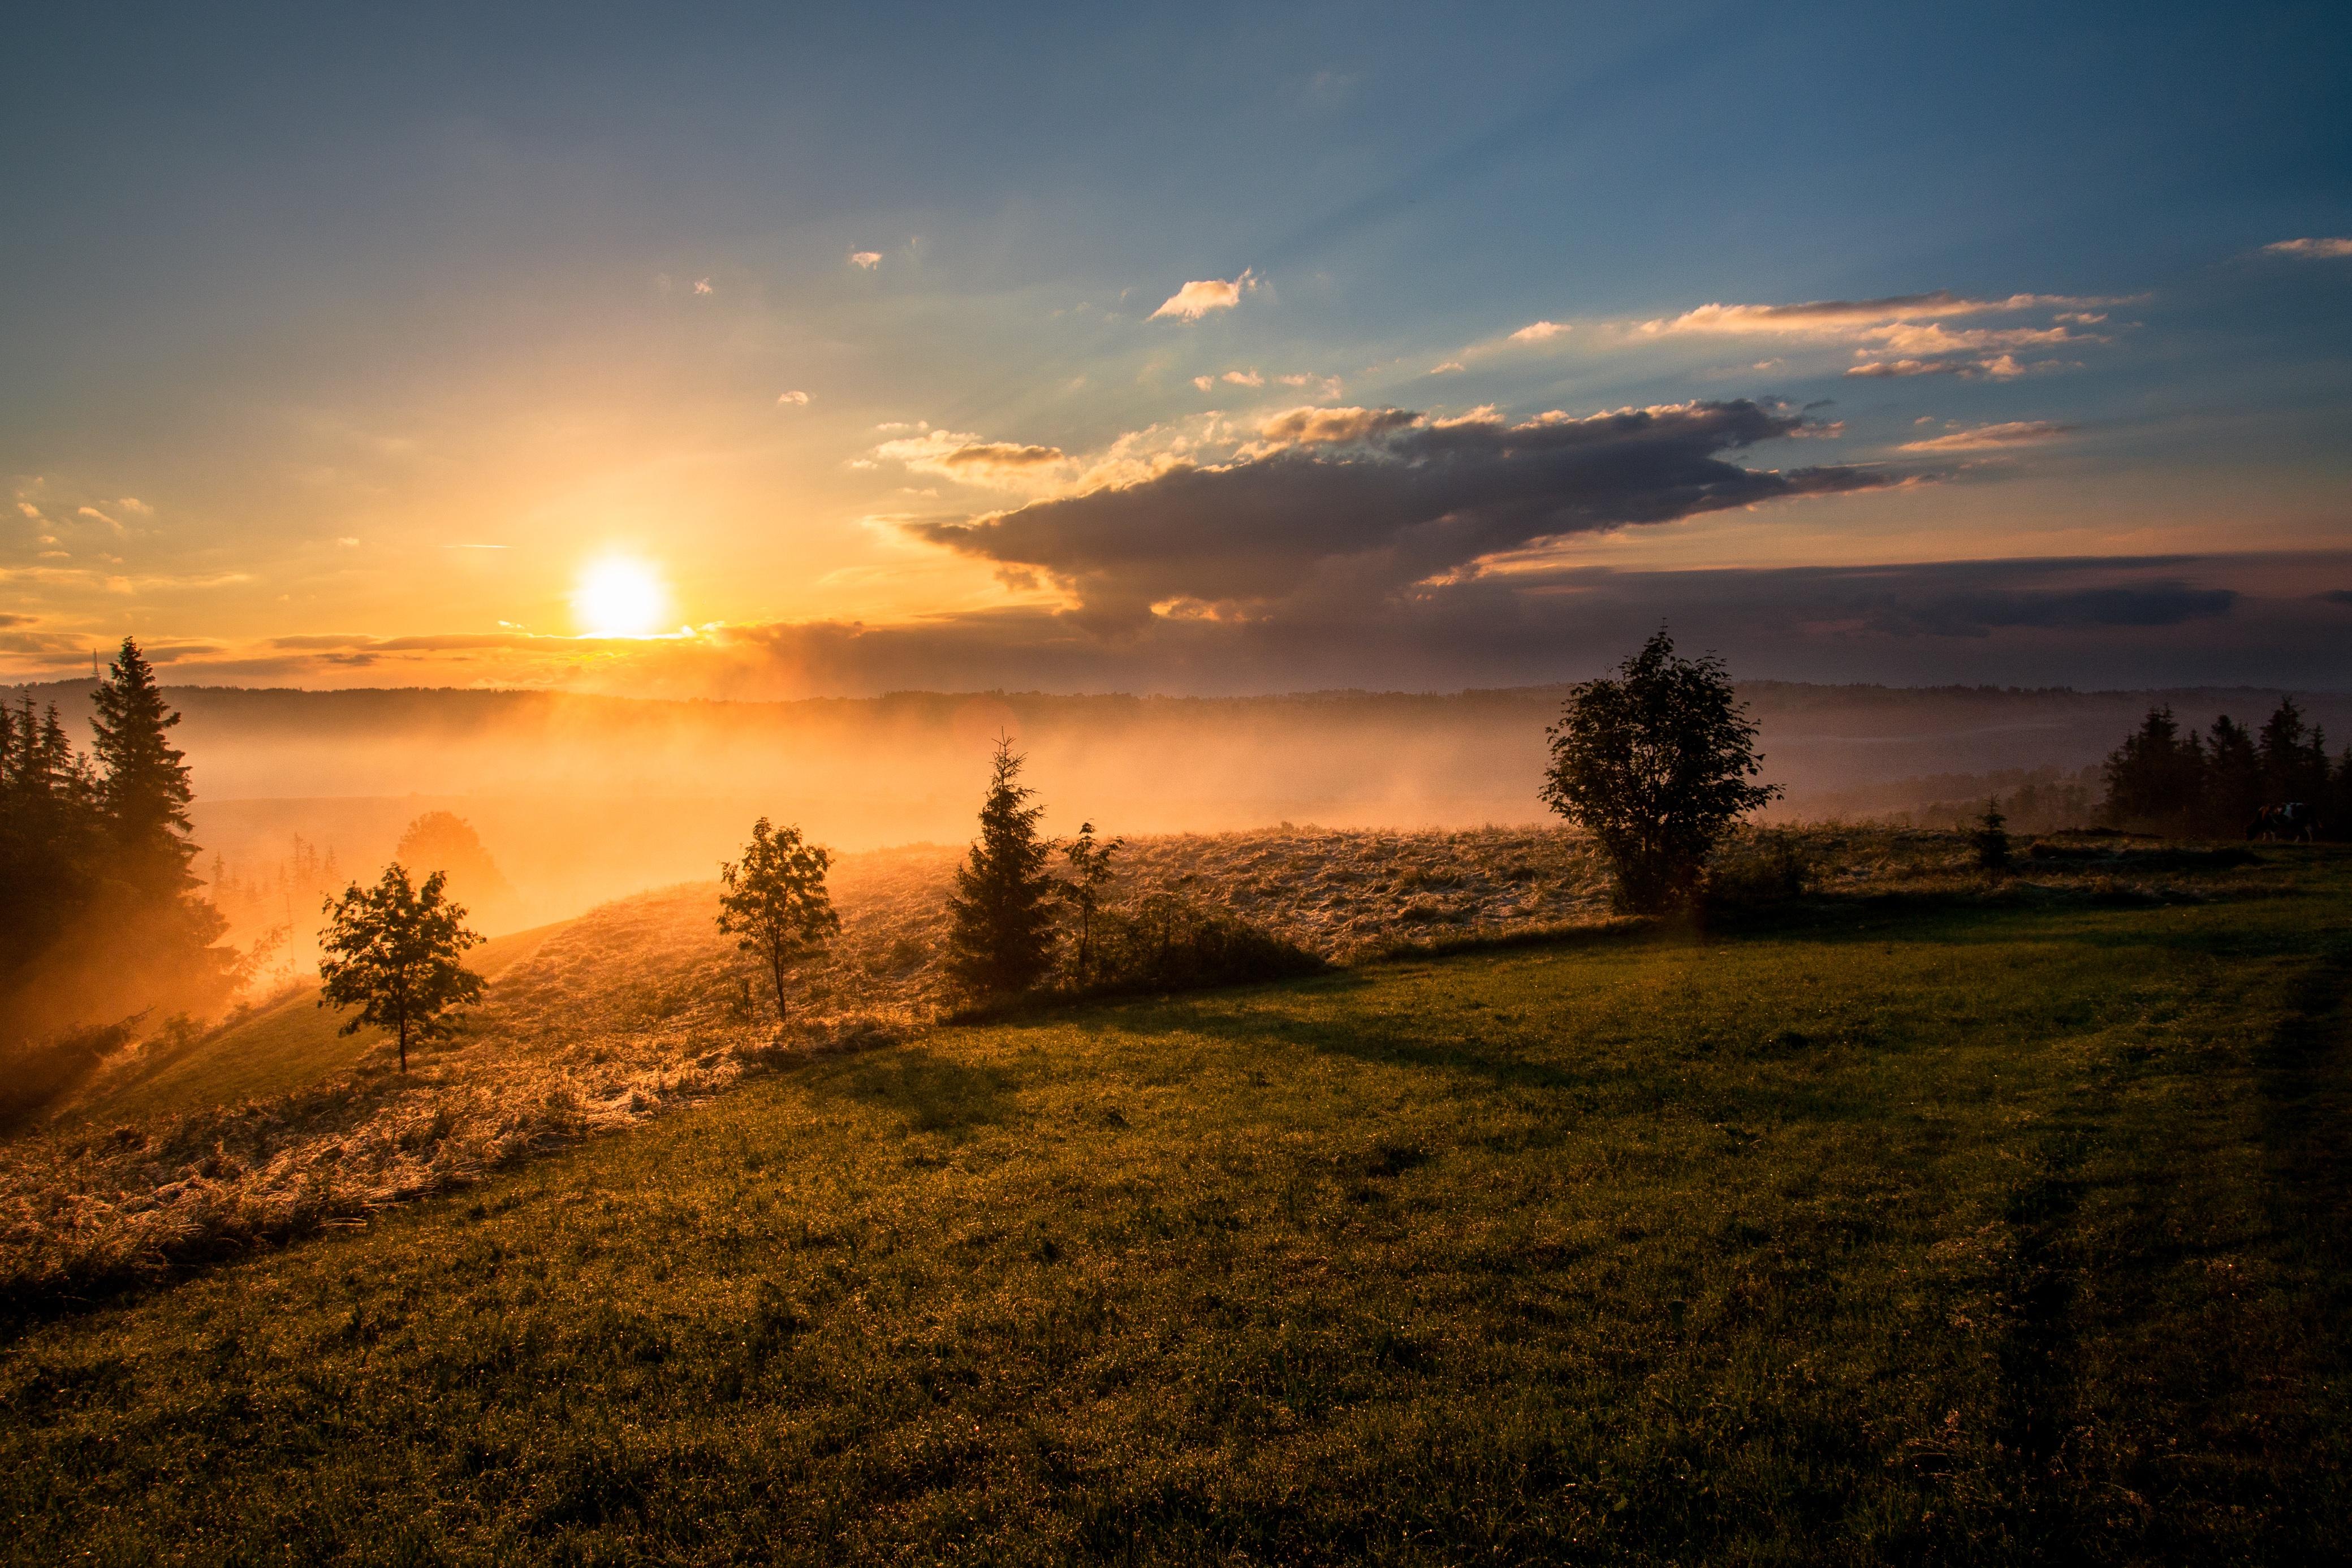 фото рассвет восход солнца всего